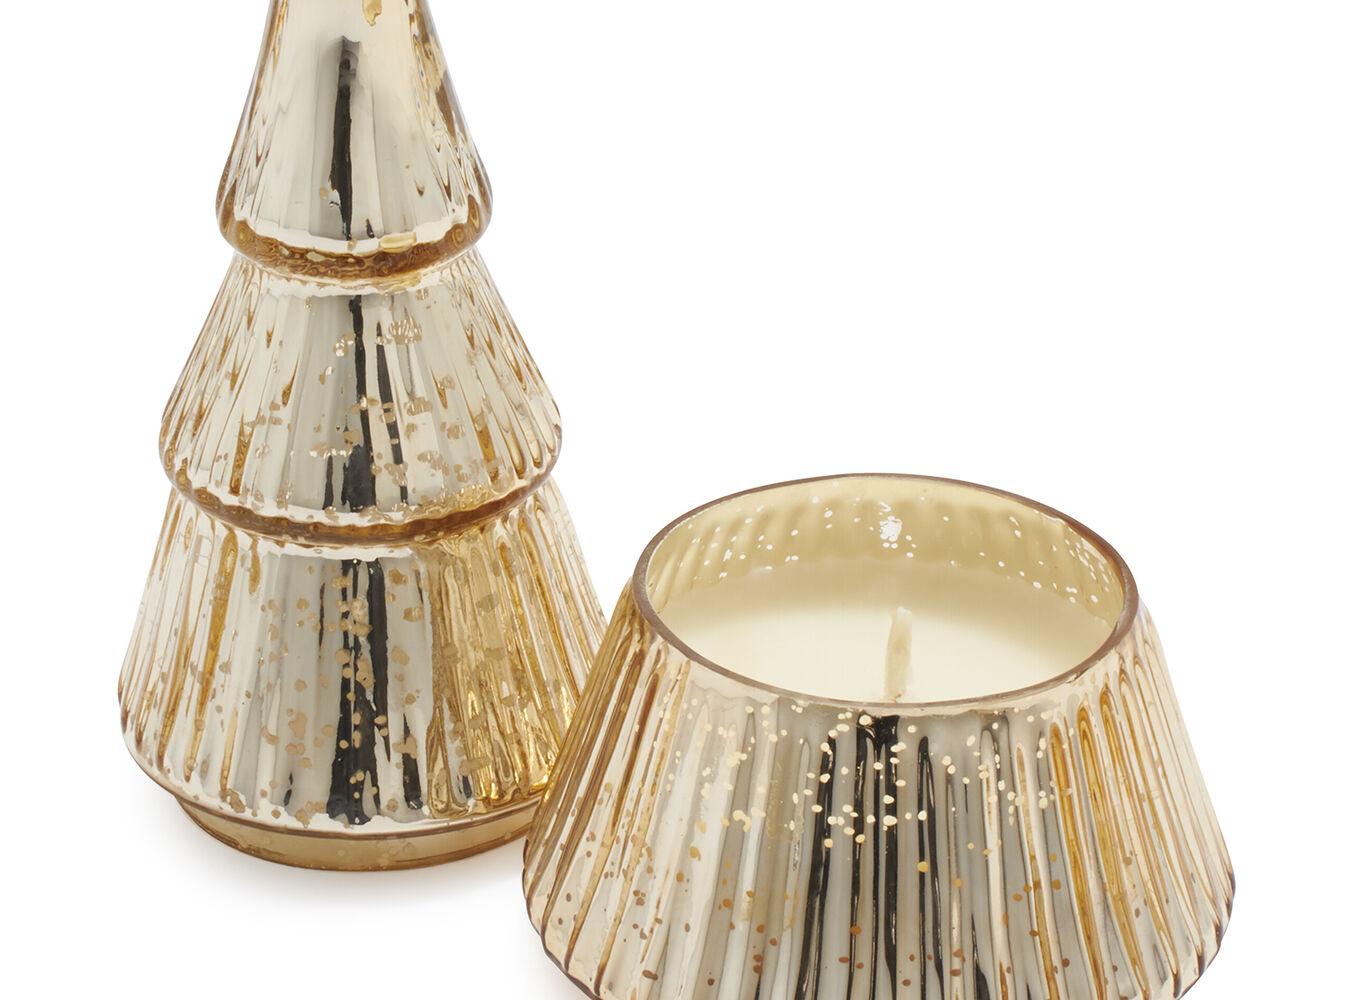 Figural Mercury Glass Christmas Tree White Peppercorn Candle, 9.3 oz.   Sur La Table